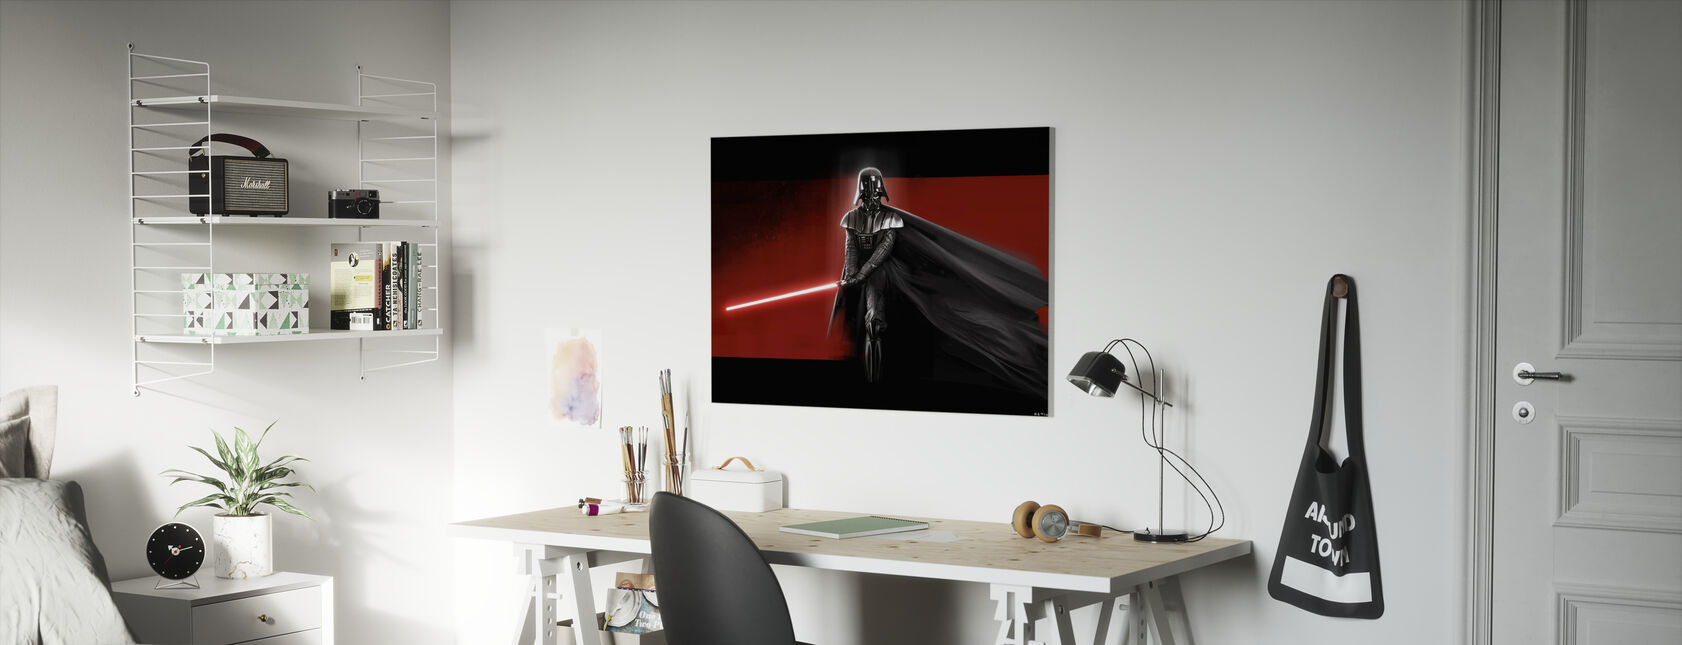 Tähtien sota - Darth Vader Punainen - Canvastaulu - Lastenhuone